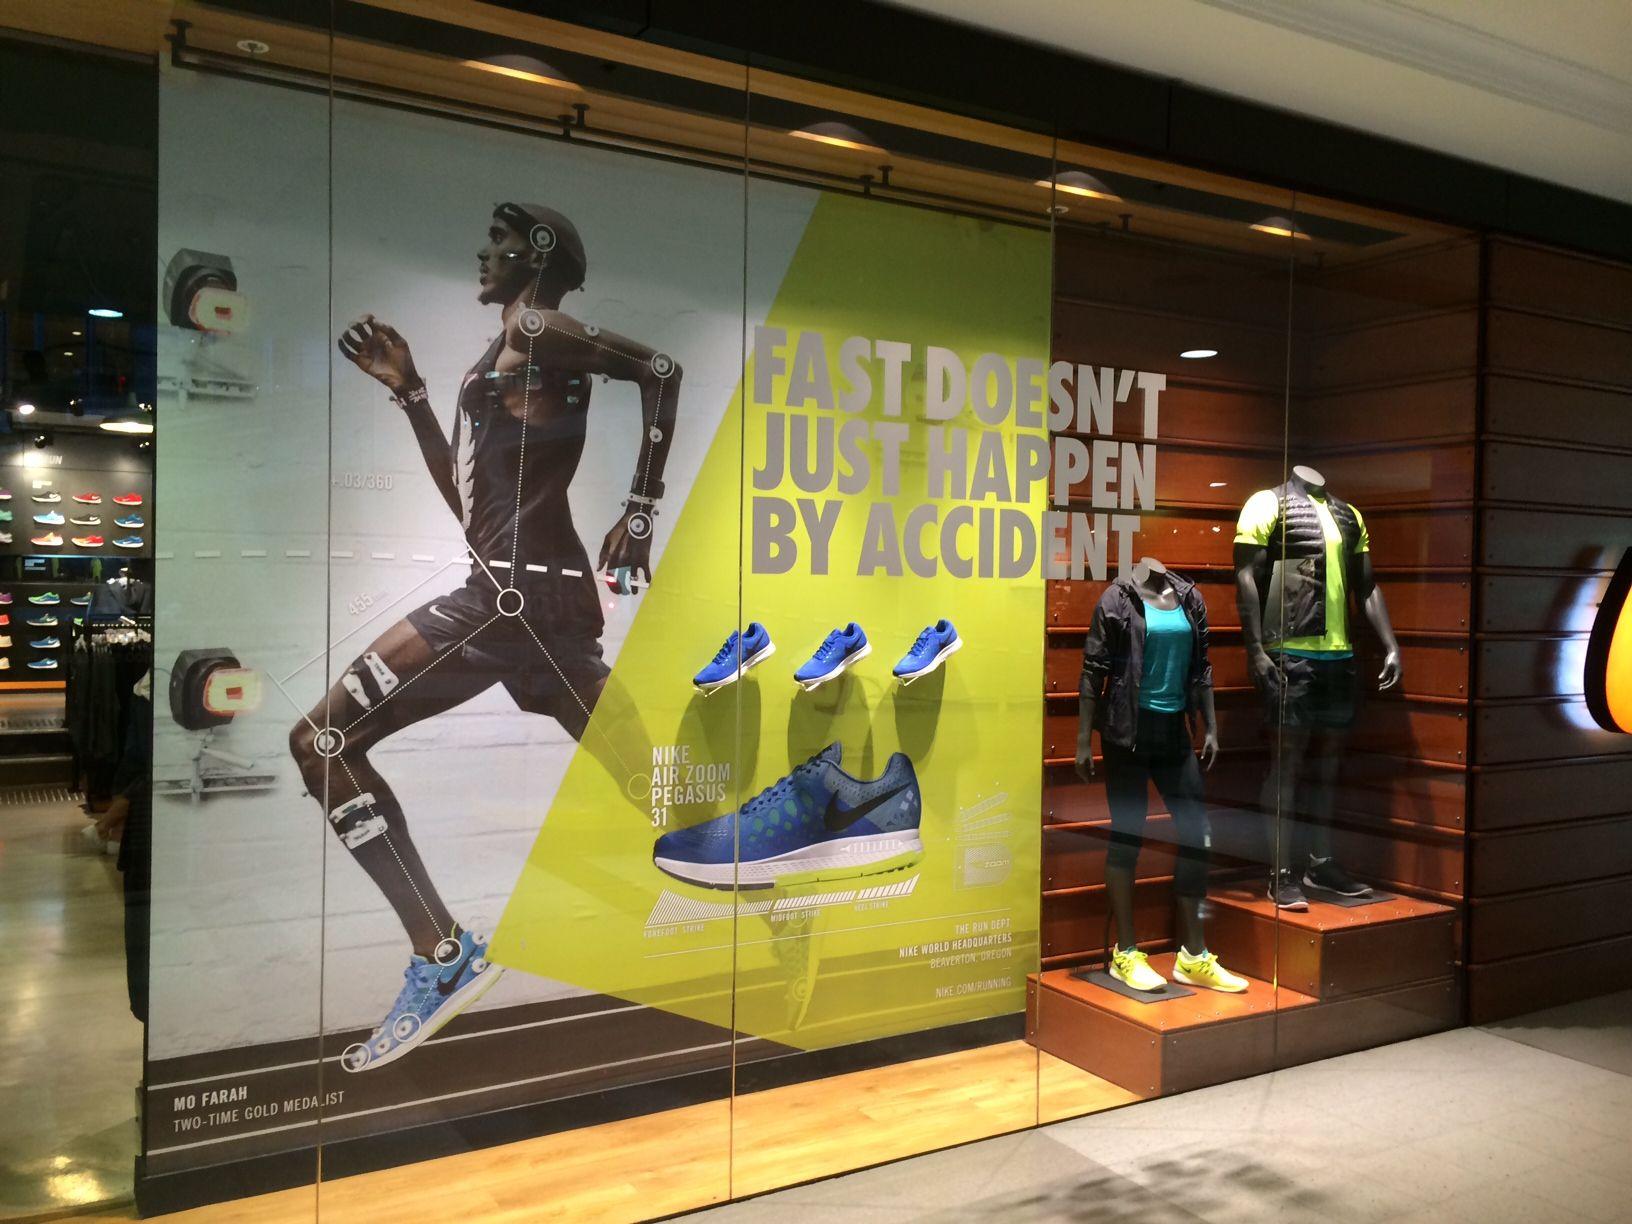 e42a798502fbd Nike Air Zoom Pegasus 31 retail window display sports shoe display ...